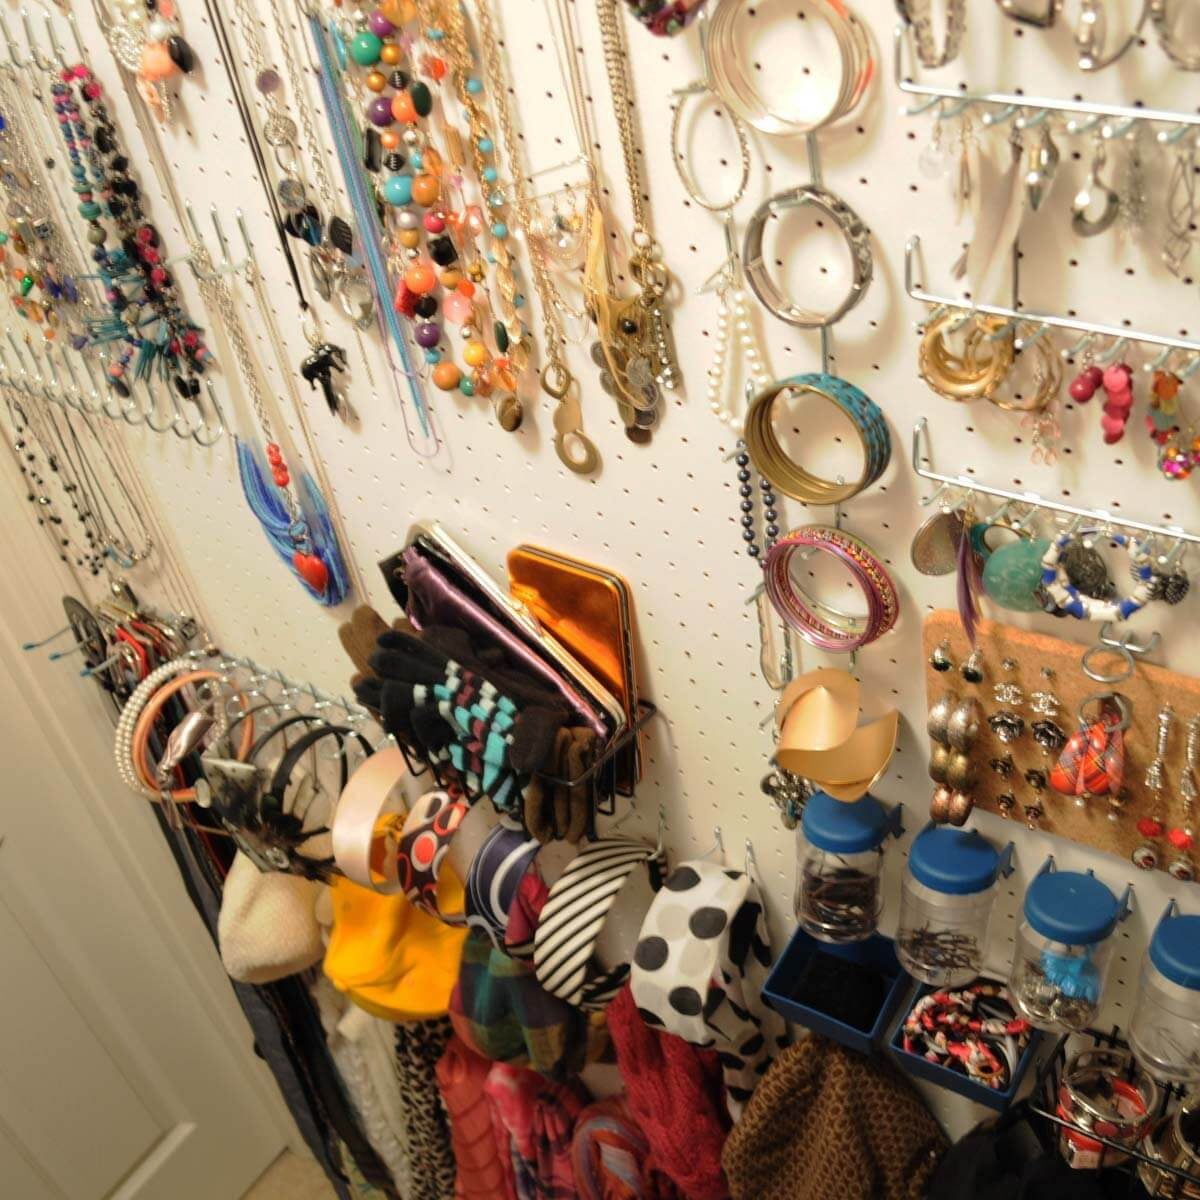 pegboard jewelry closet organization